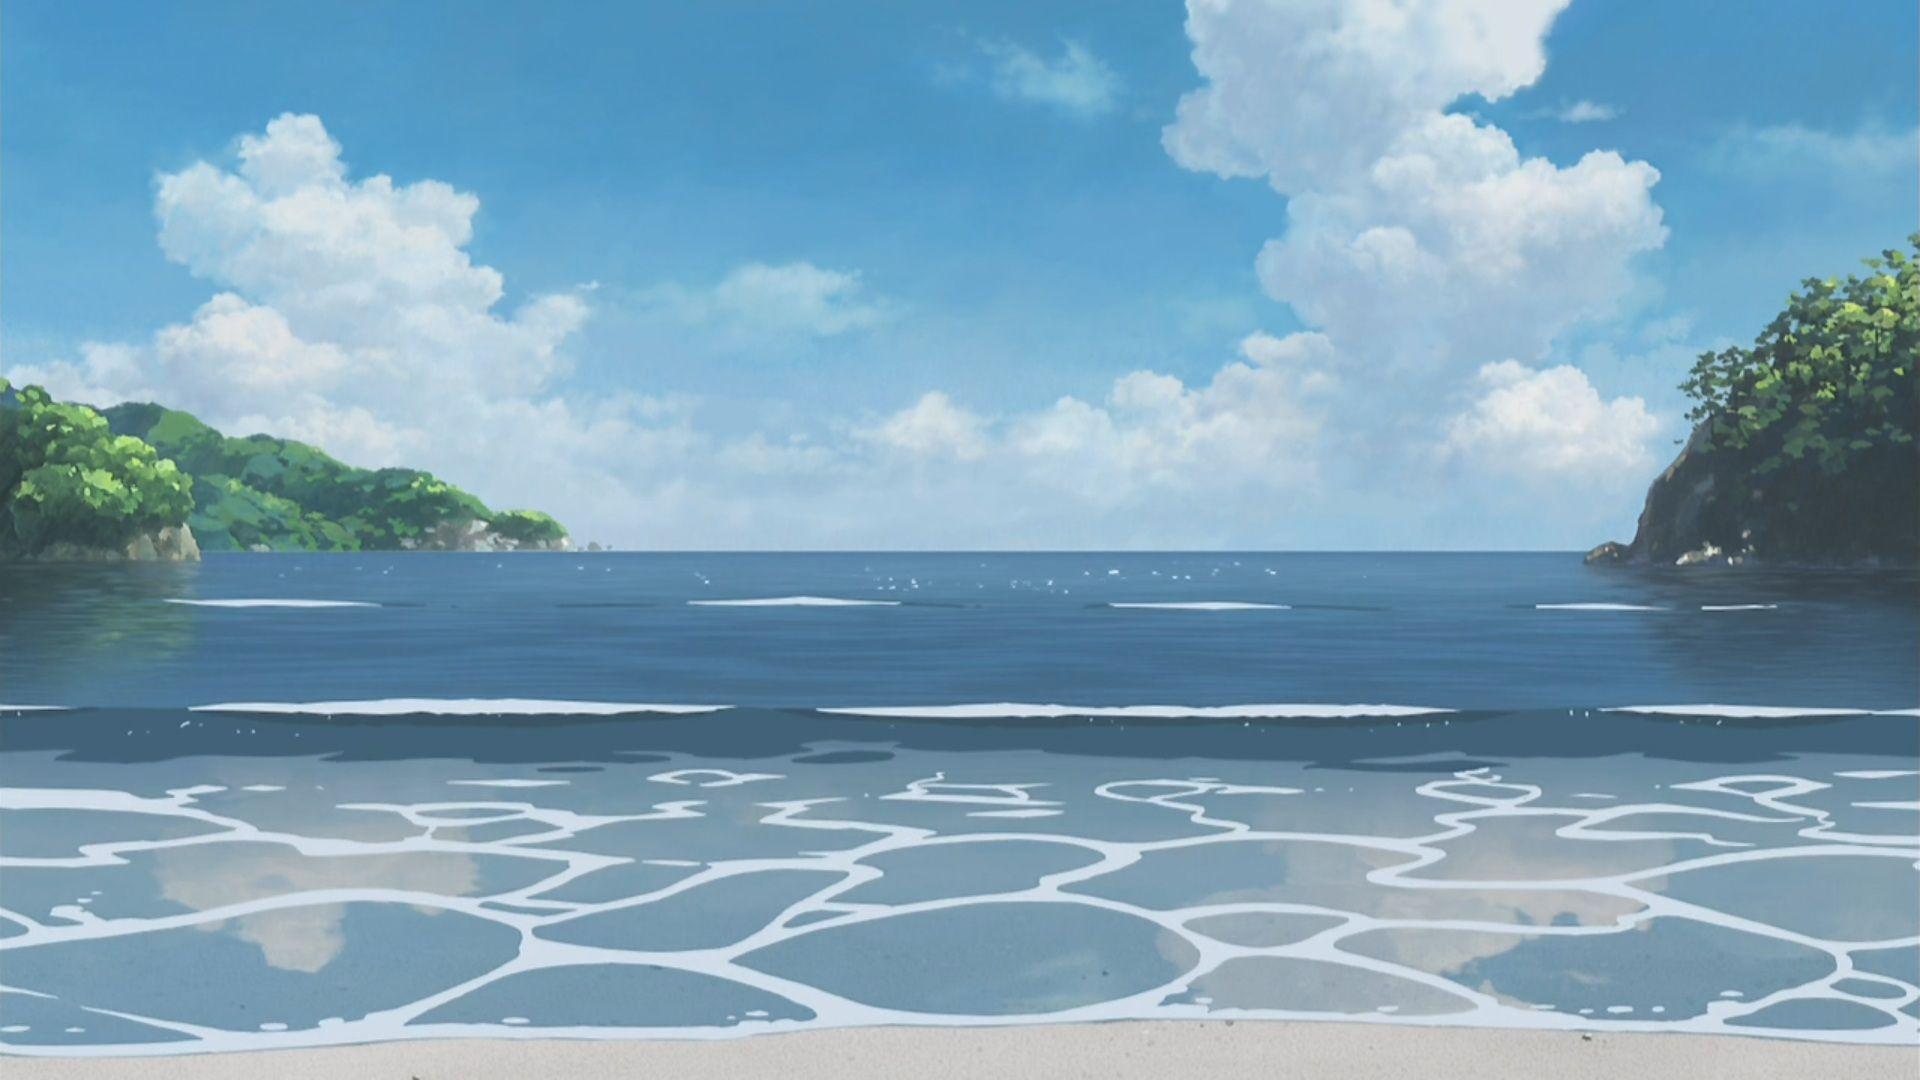 anime scenery wallpaper 4k